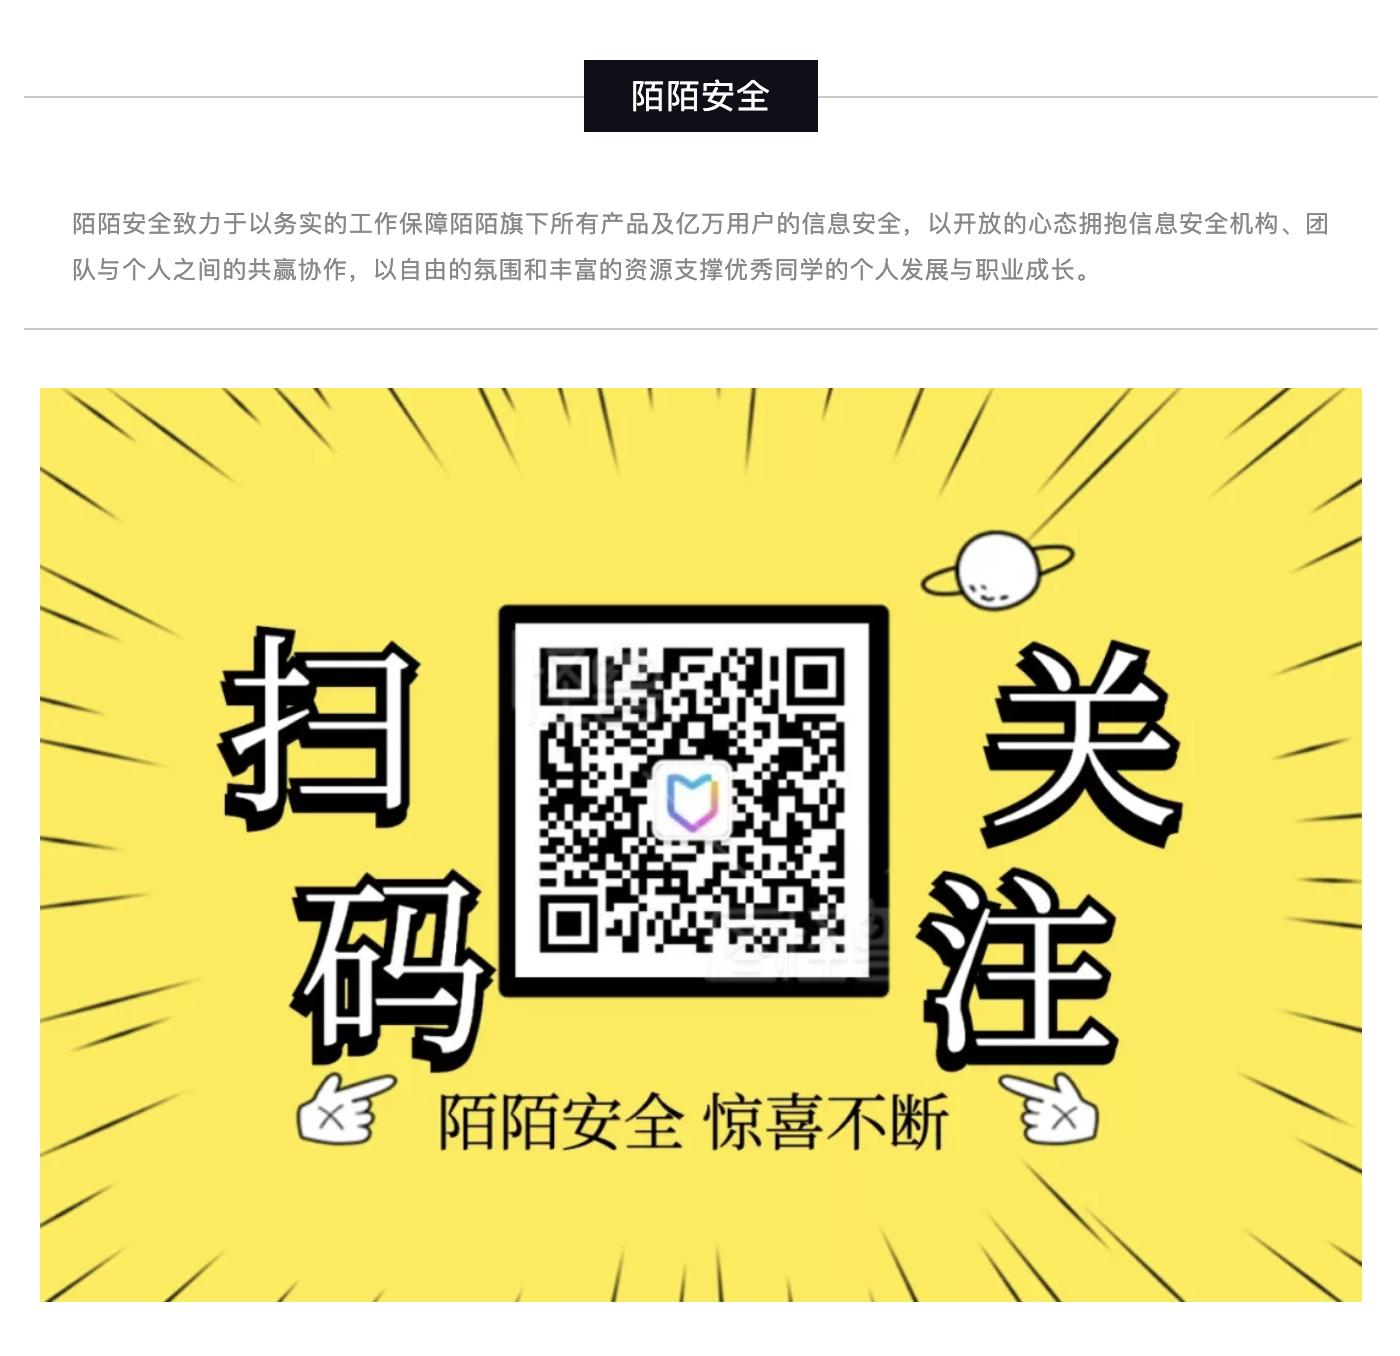 https://momo-mmsrc.oss-cn-hangzhou.aliyuncs.com/img-a81941c2-e813-32bb-a75b-2a909431b45f.png